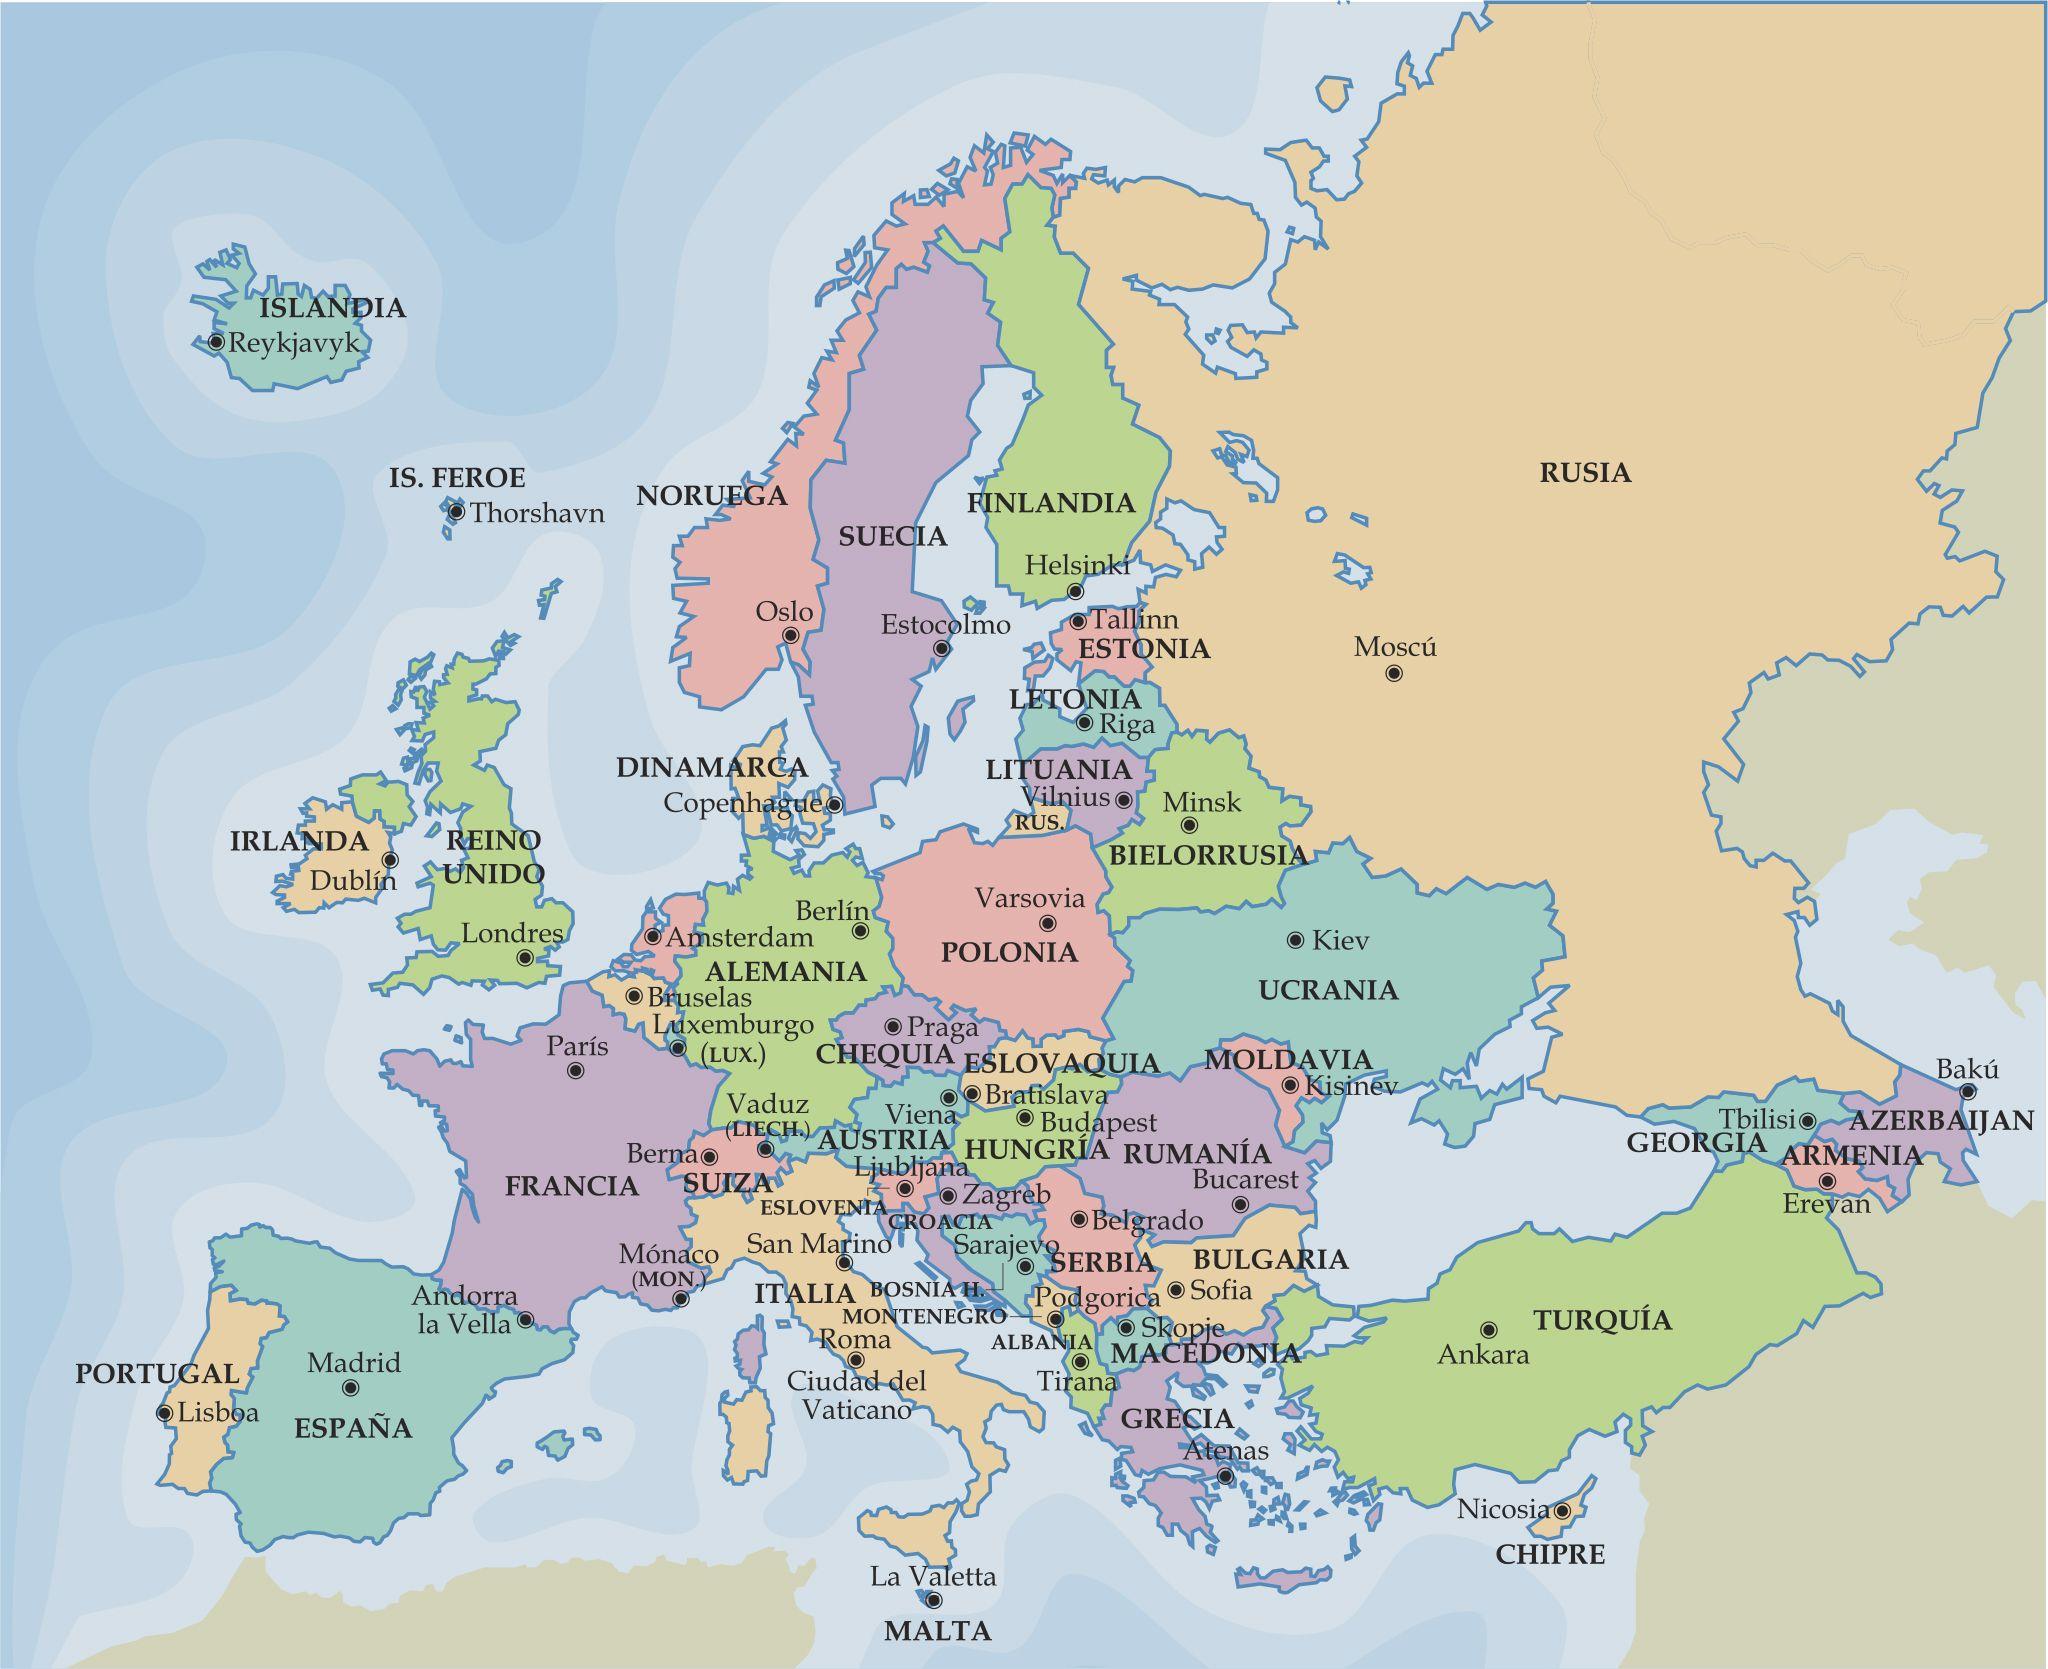 Mapa Europa En Español.Mapa De Europa En Espanol Spanish Languages Europe 2